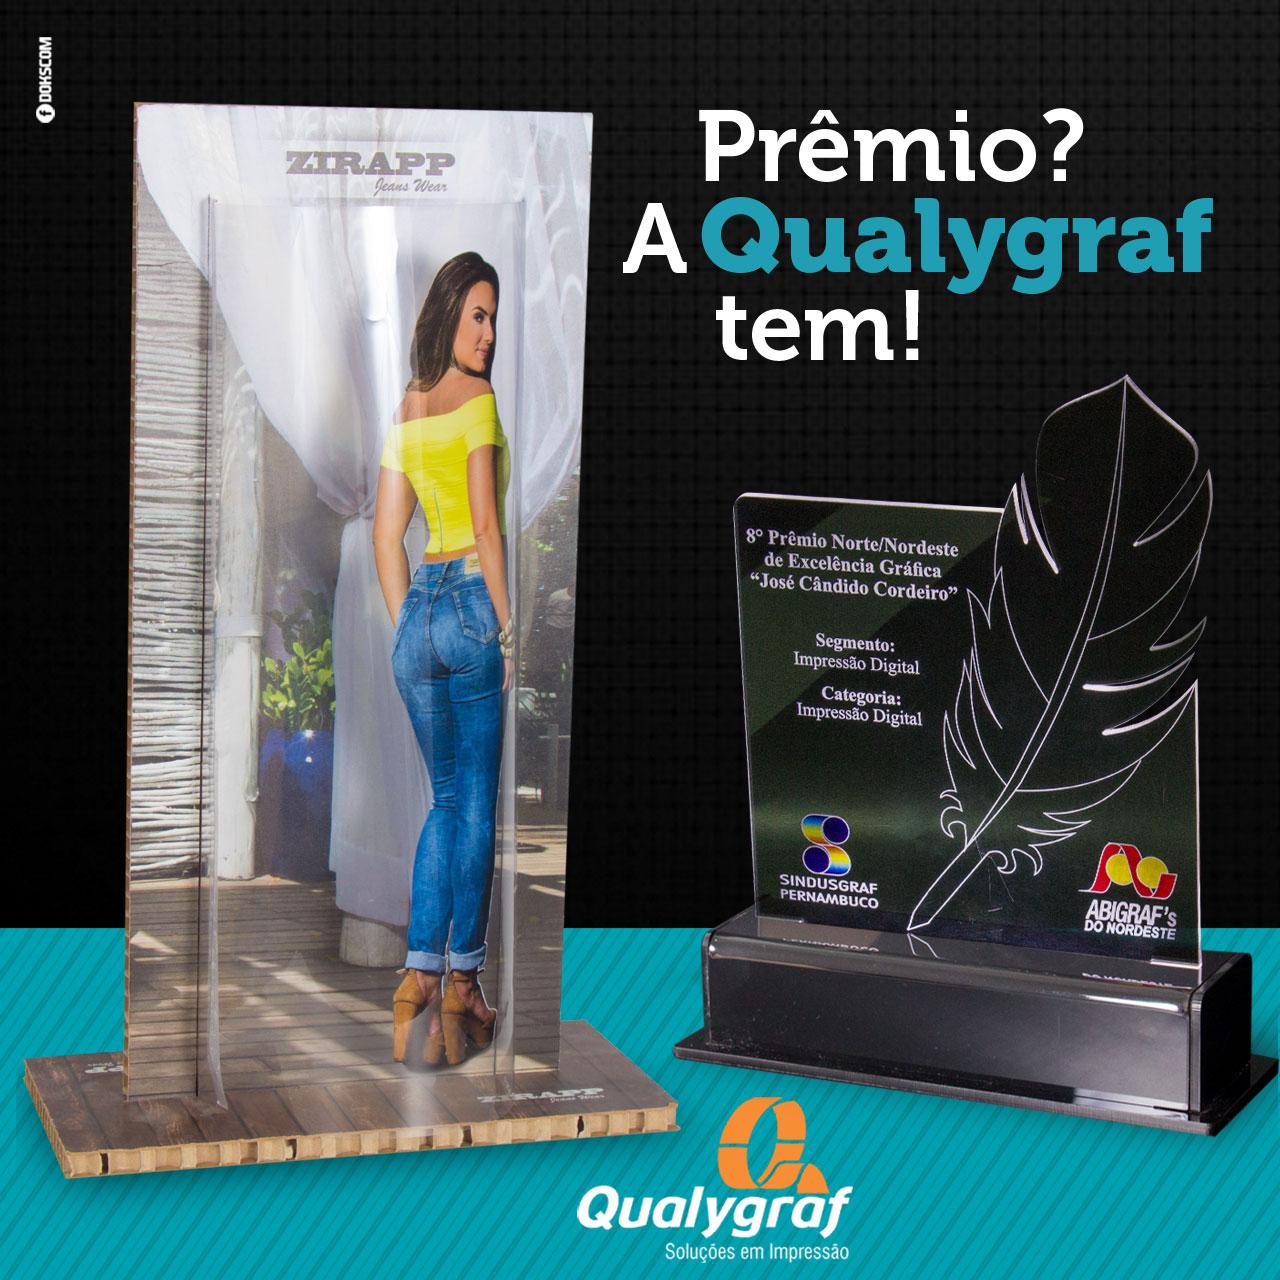 PREMIO-QUALYGRAF-ZIRAP